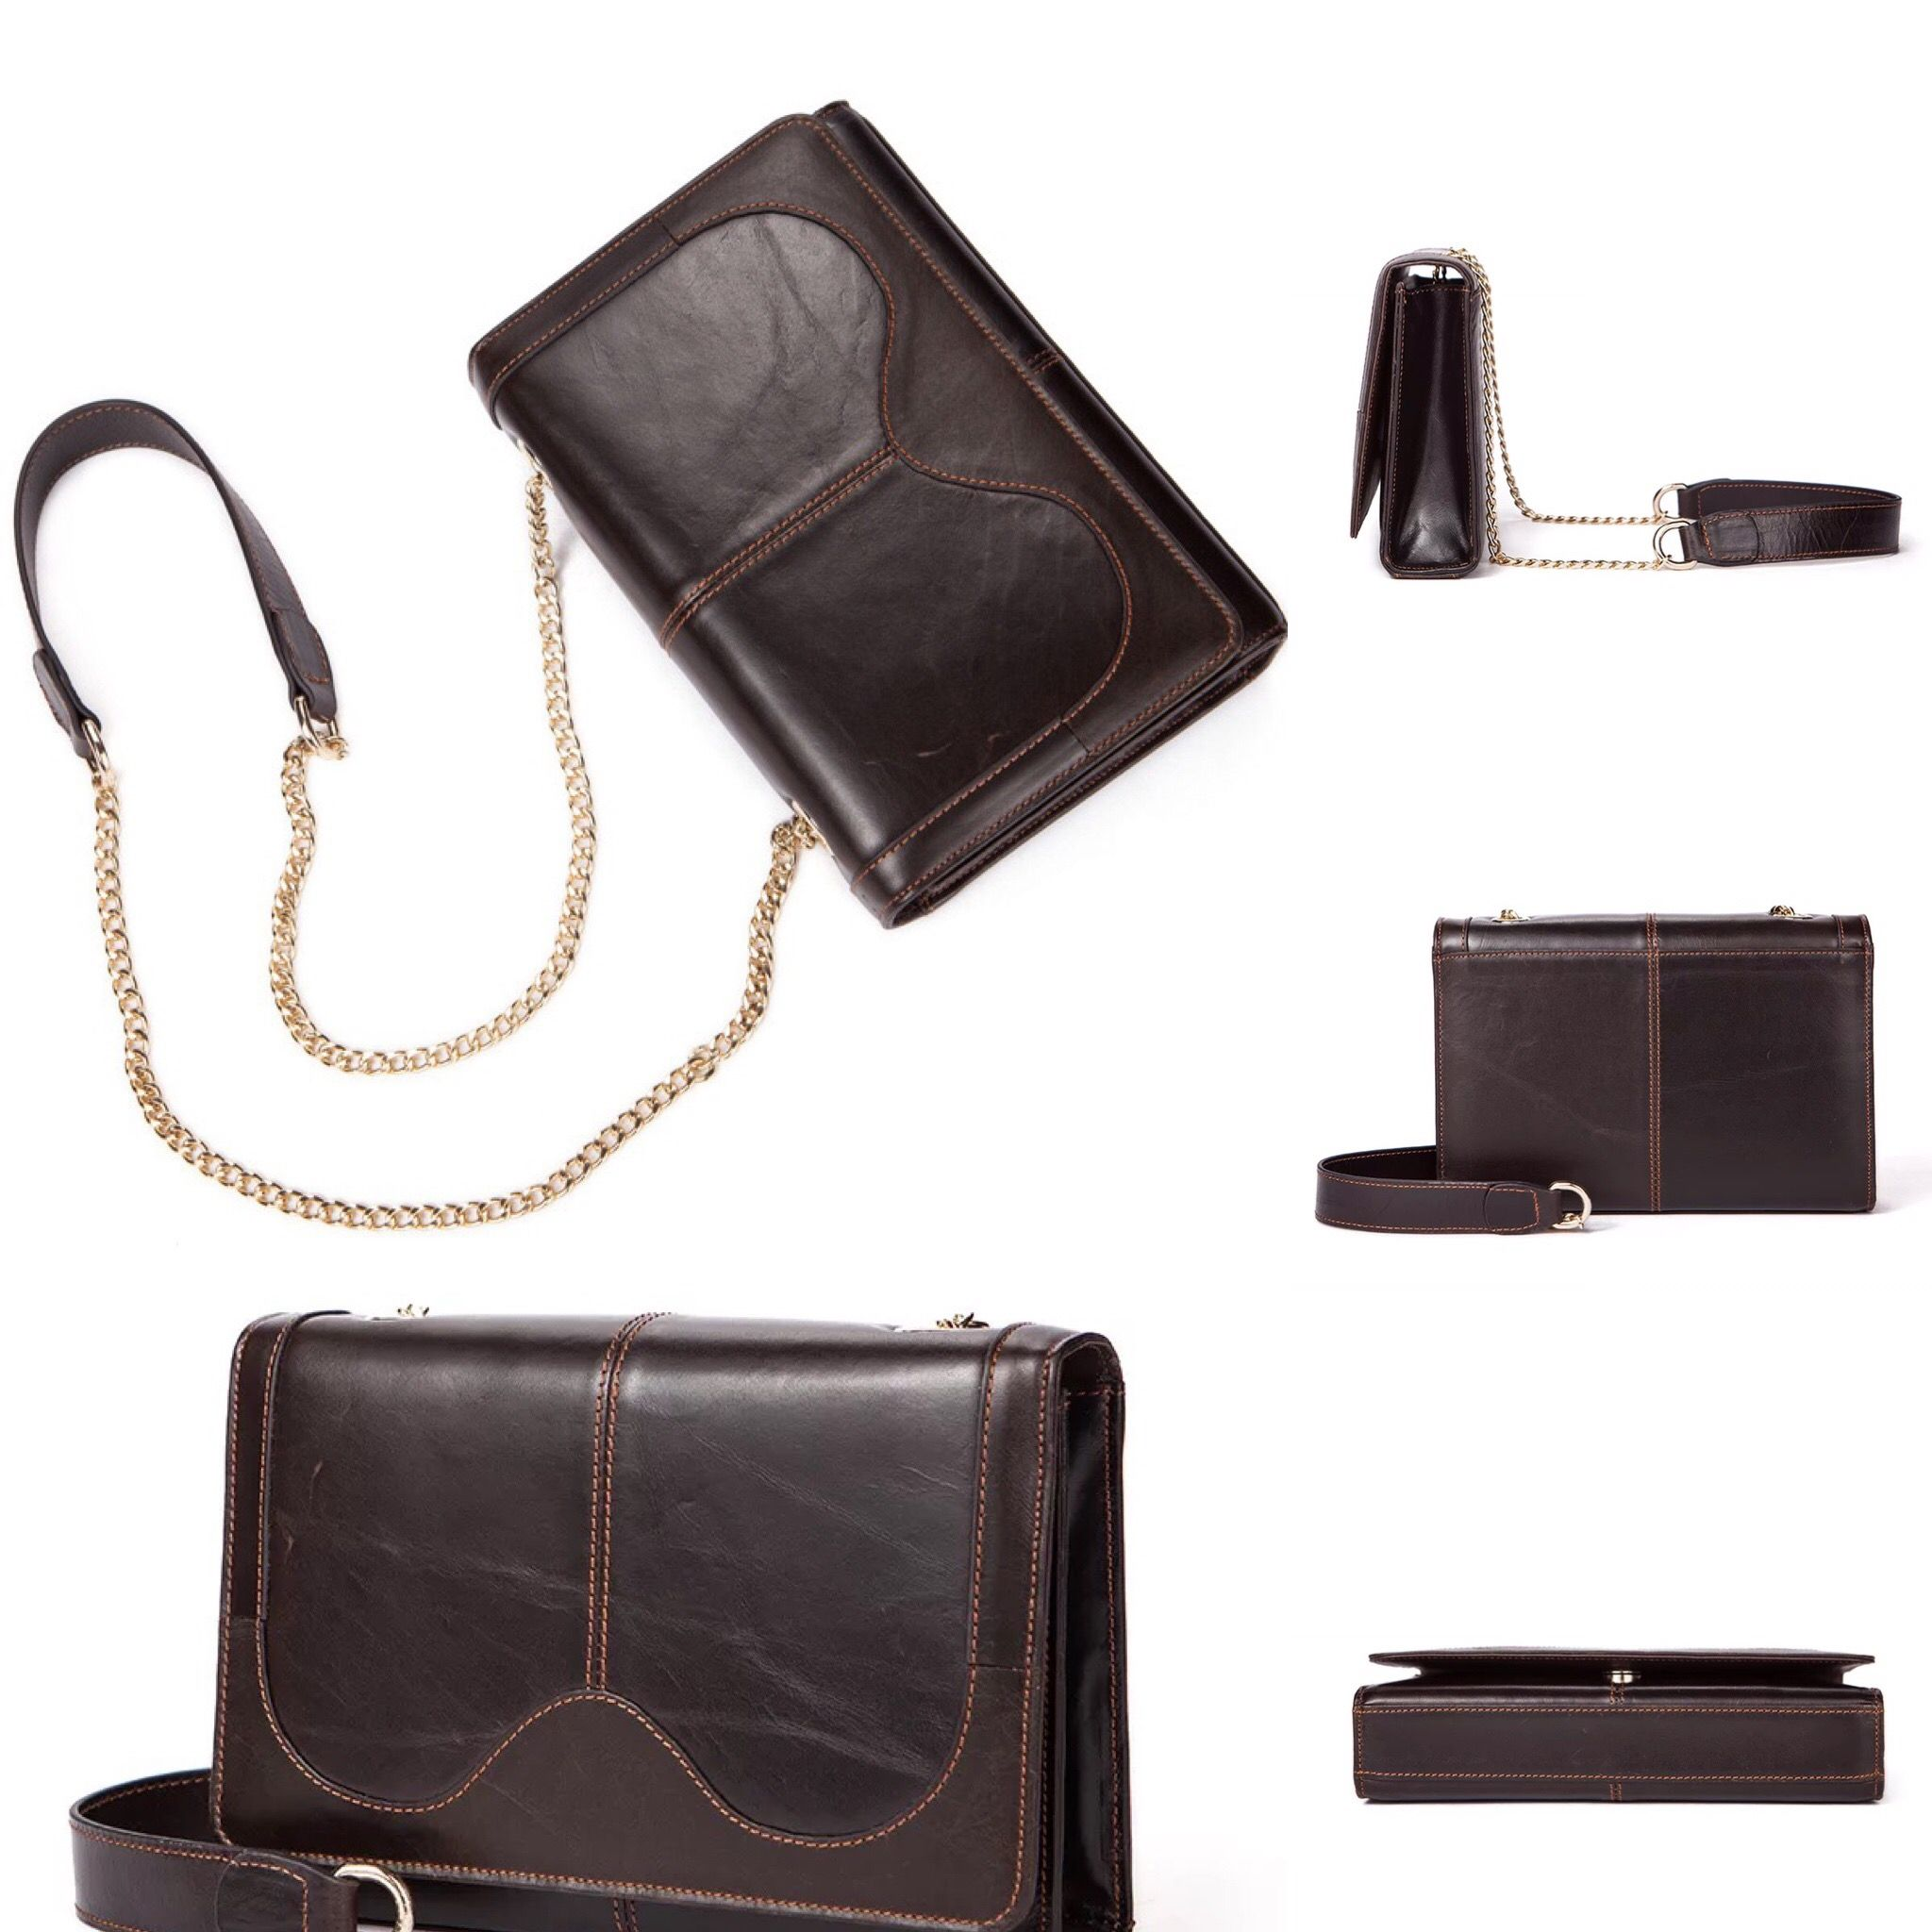 2017 Leather Handbags Korean Version Of The Retro Lady Shoulder Bag